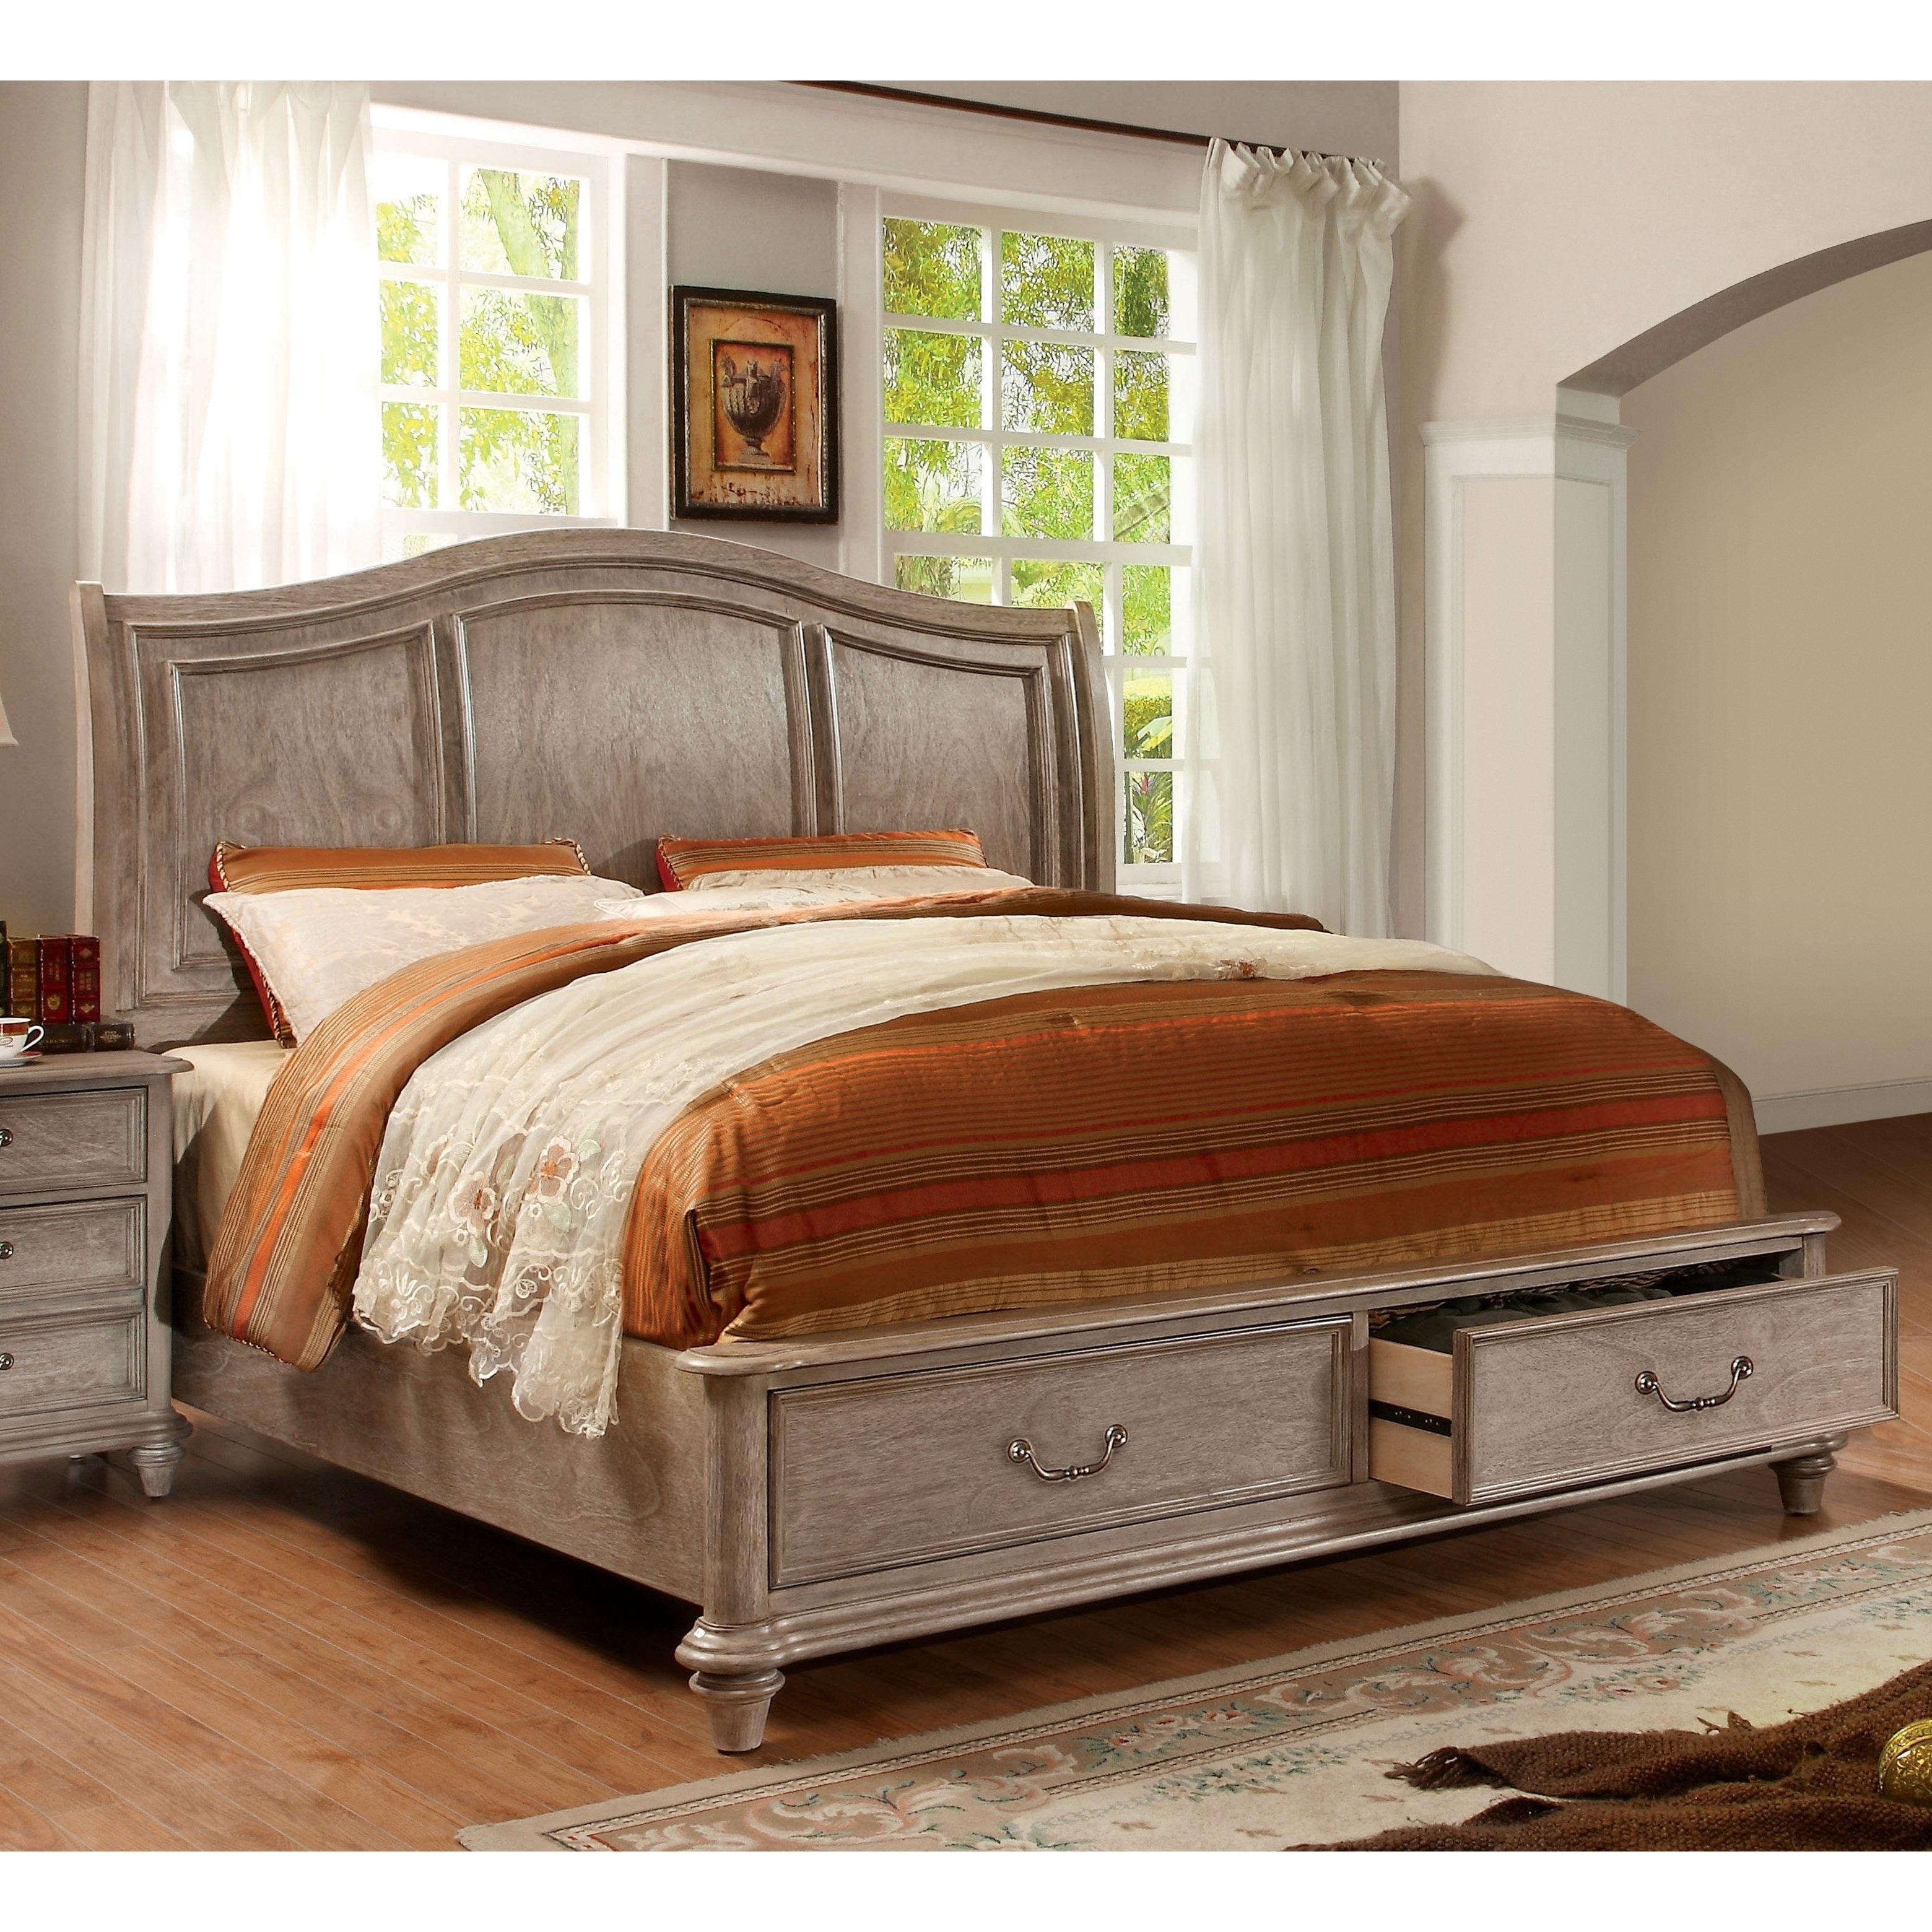 Furniture of America Minka III Rustic Grey Storage Platfo...